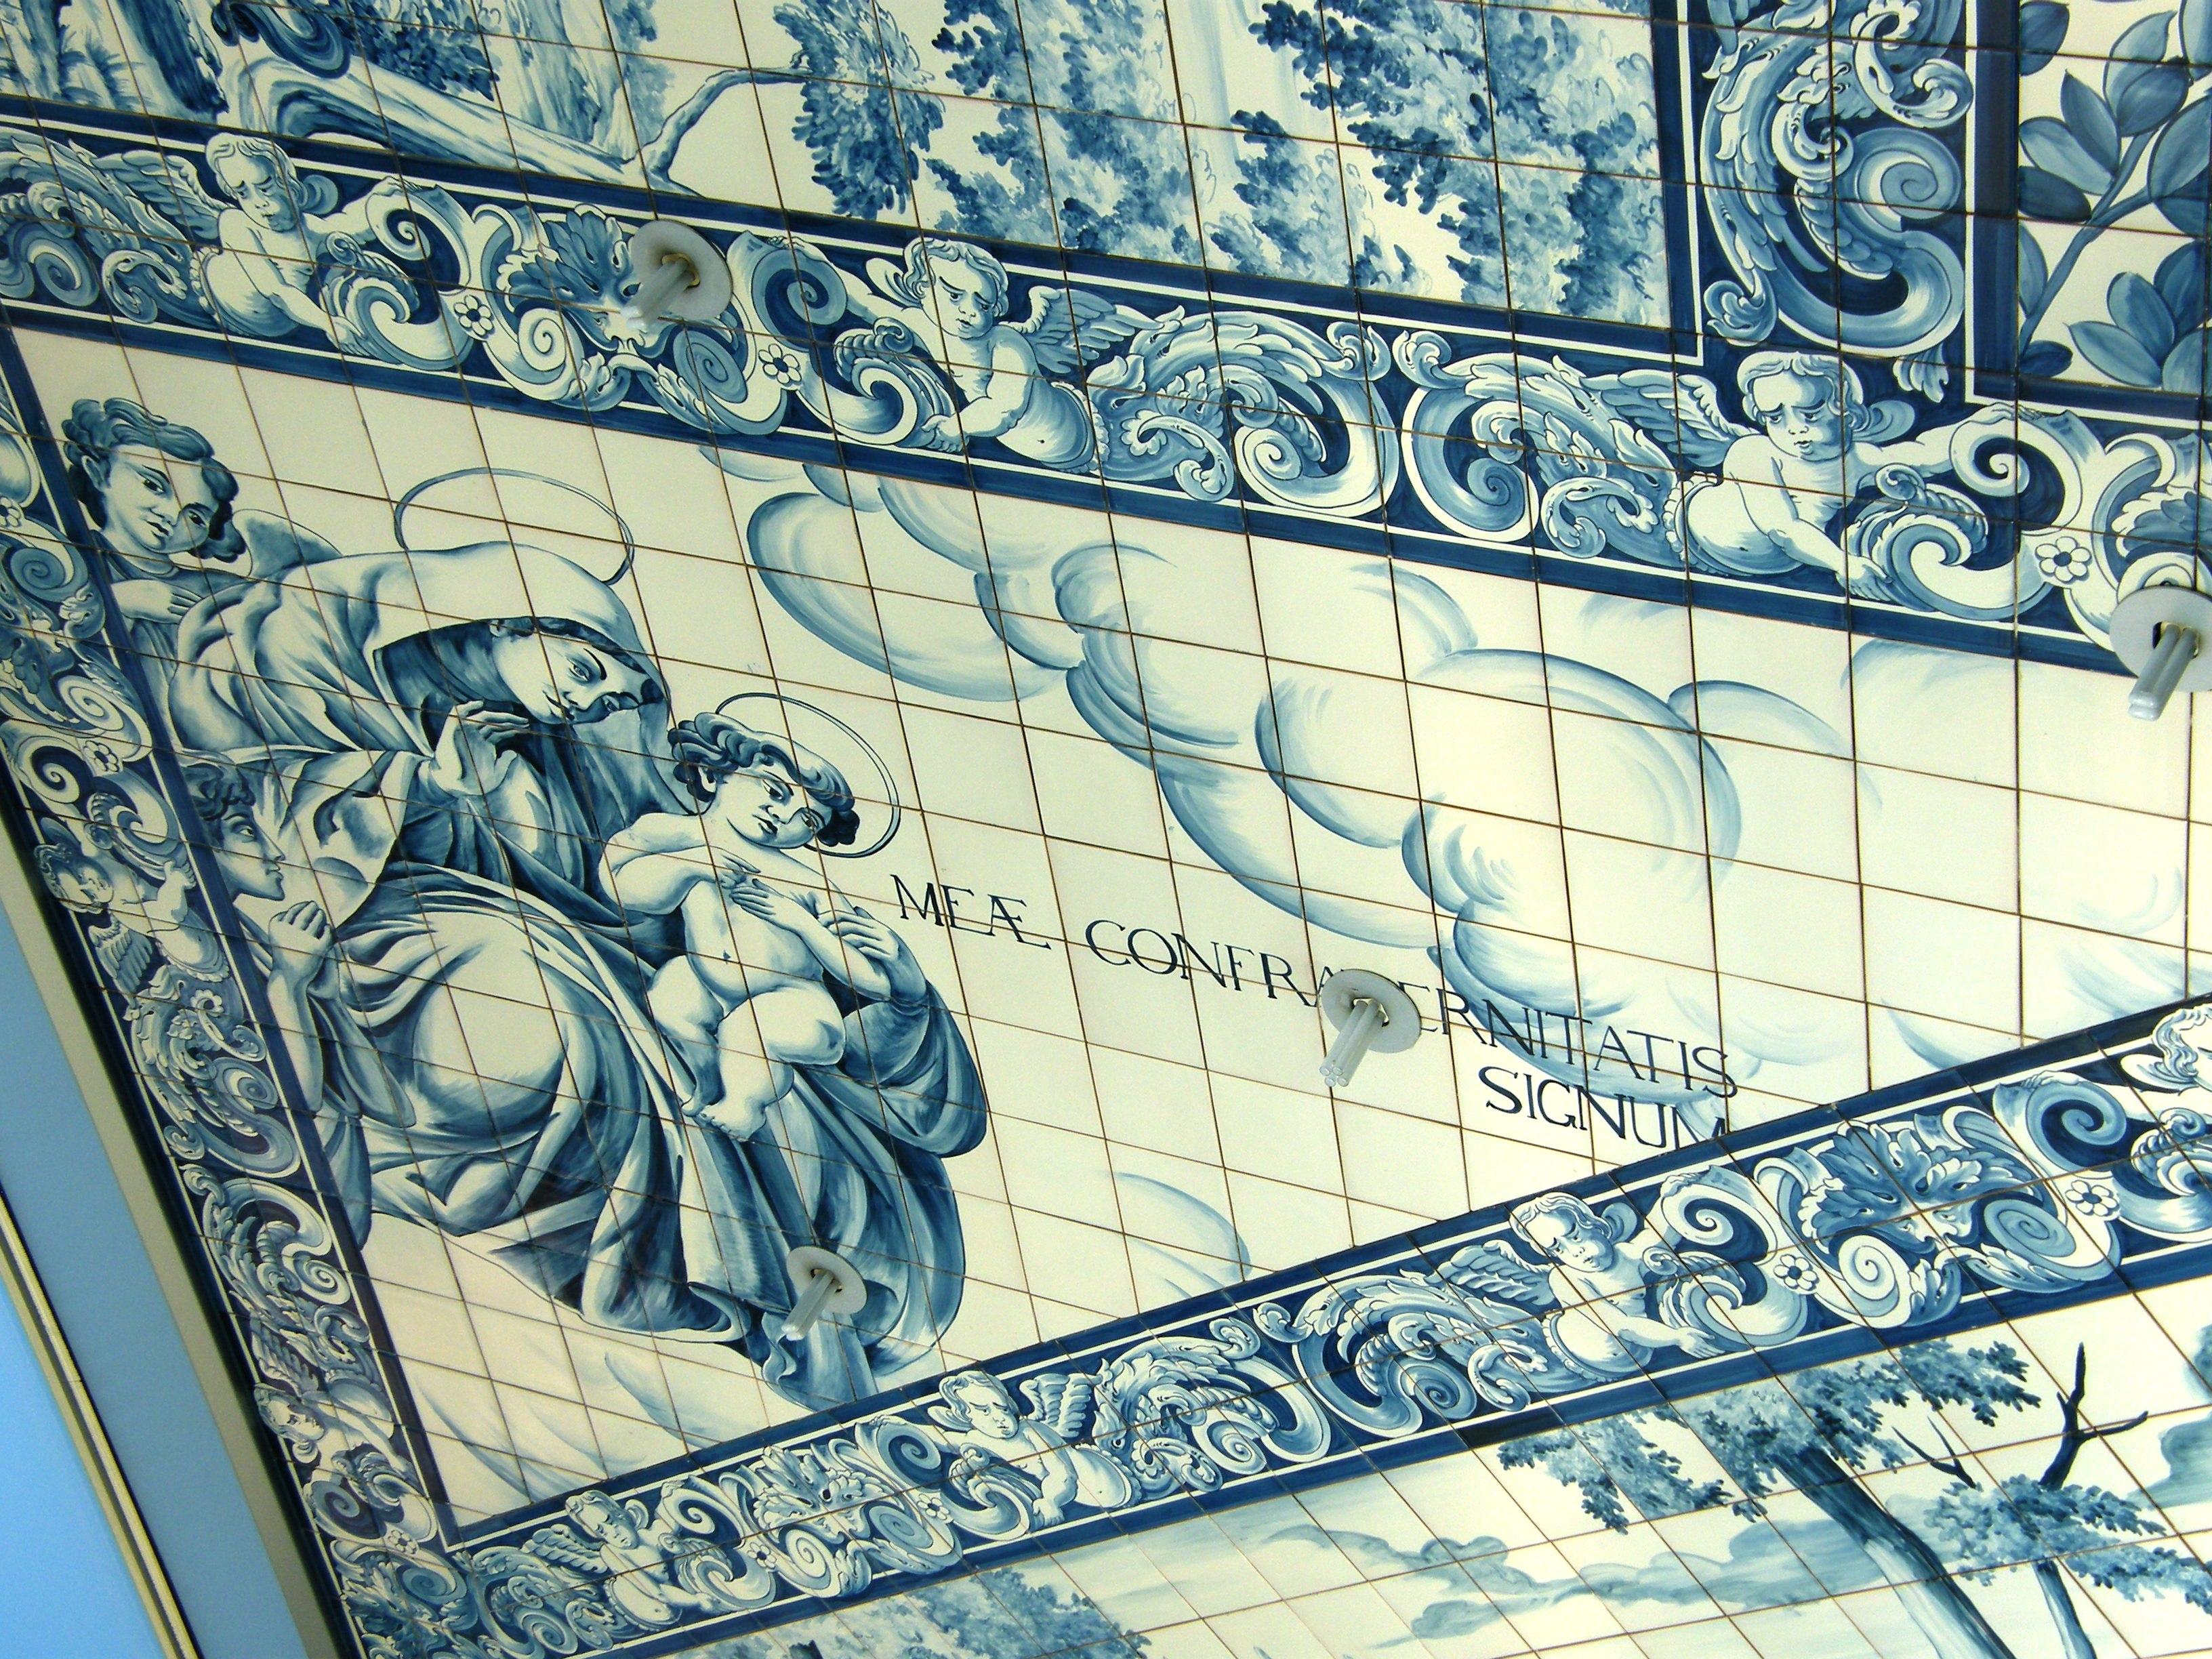 Detail of ceiling tiles in the new Casa da Musica in Porto built in 2008